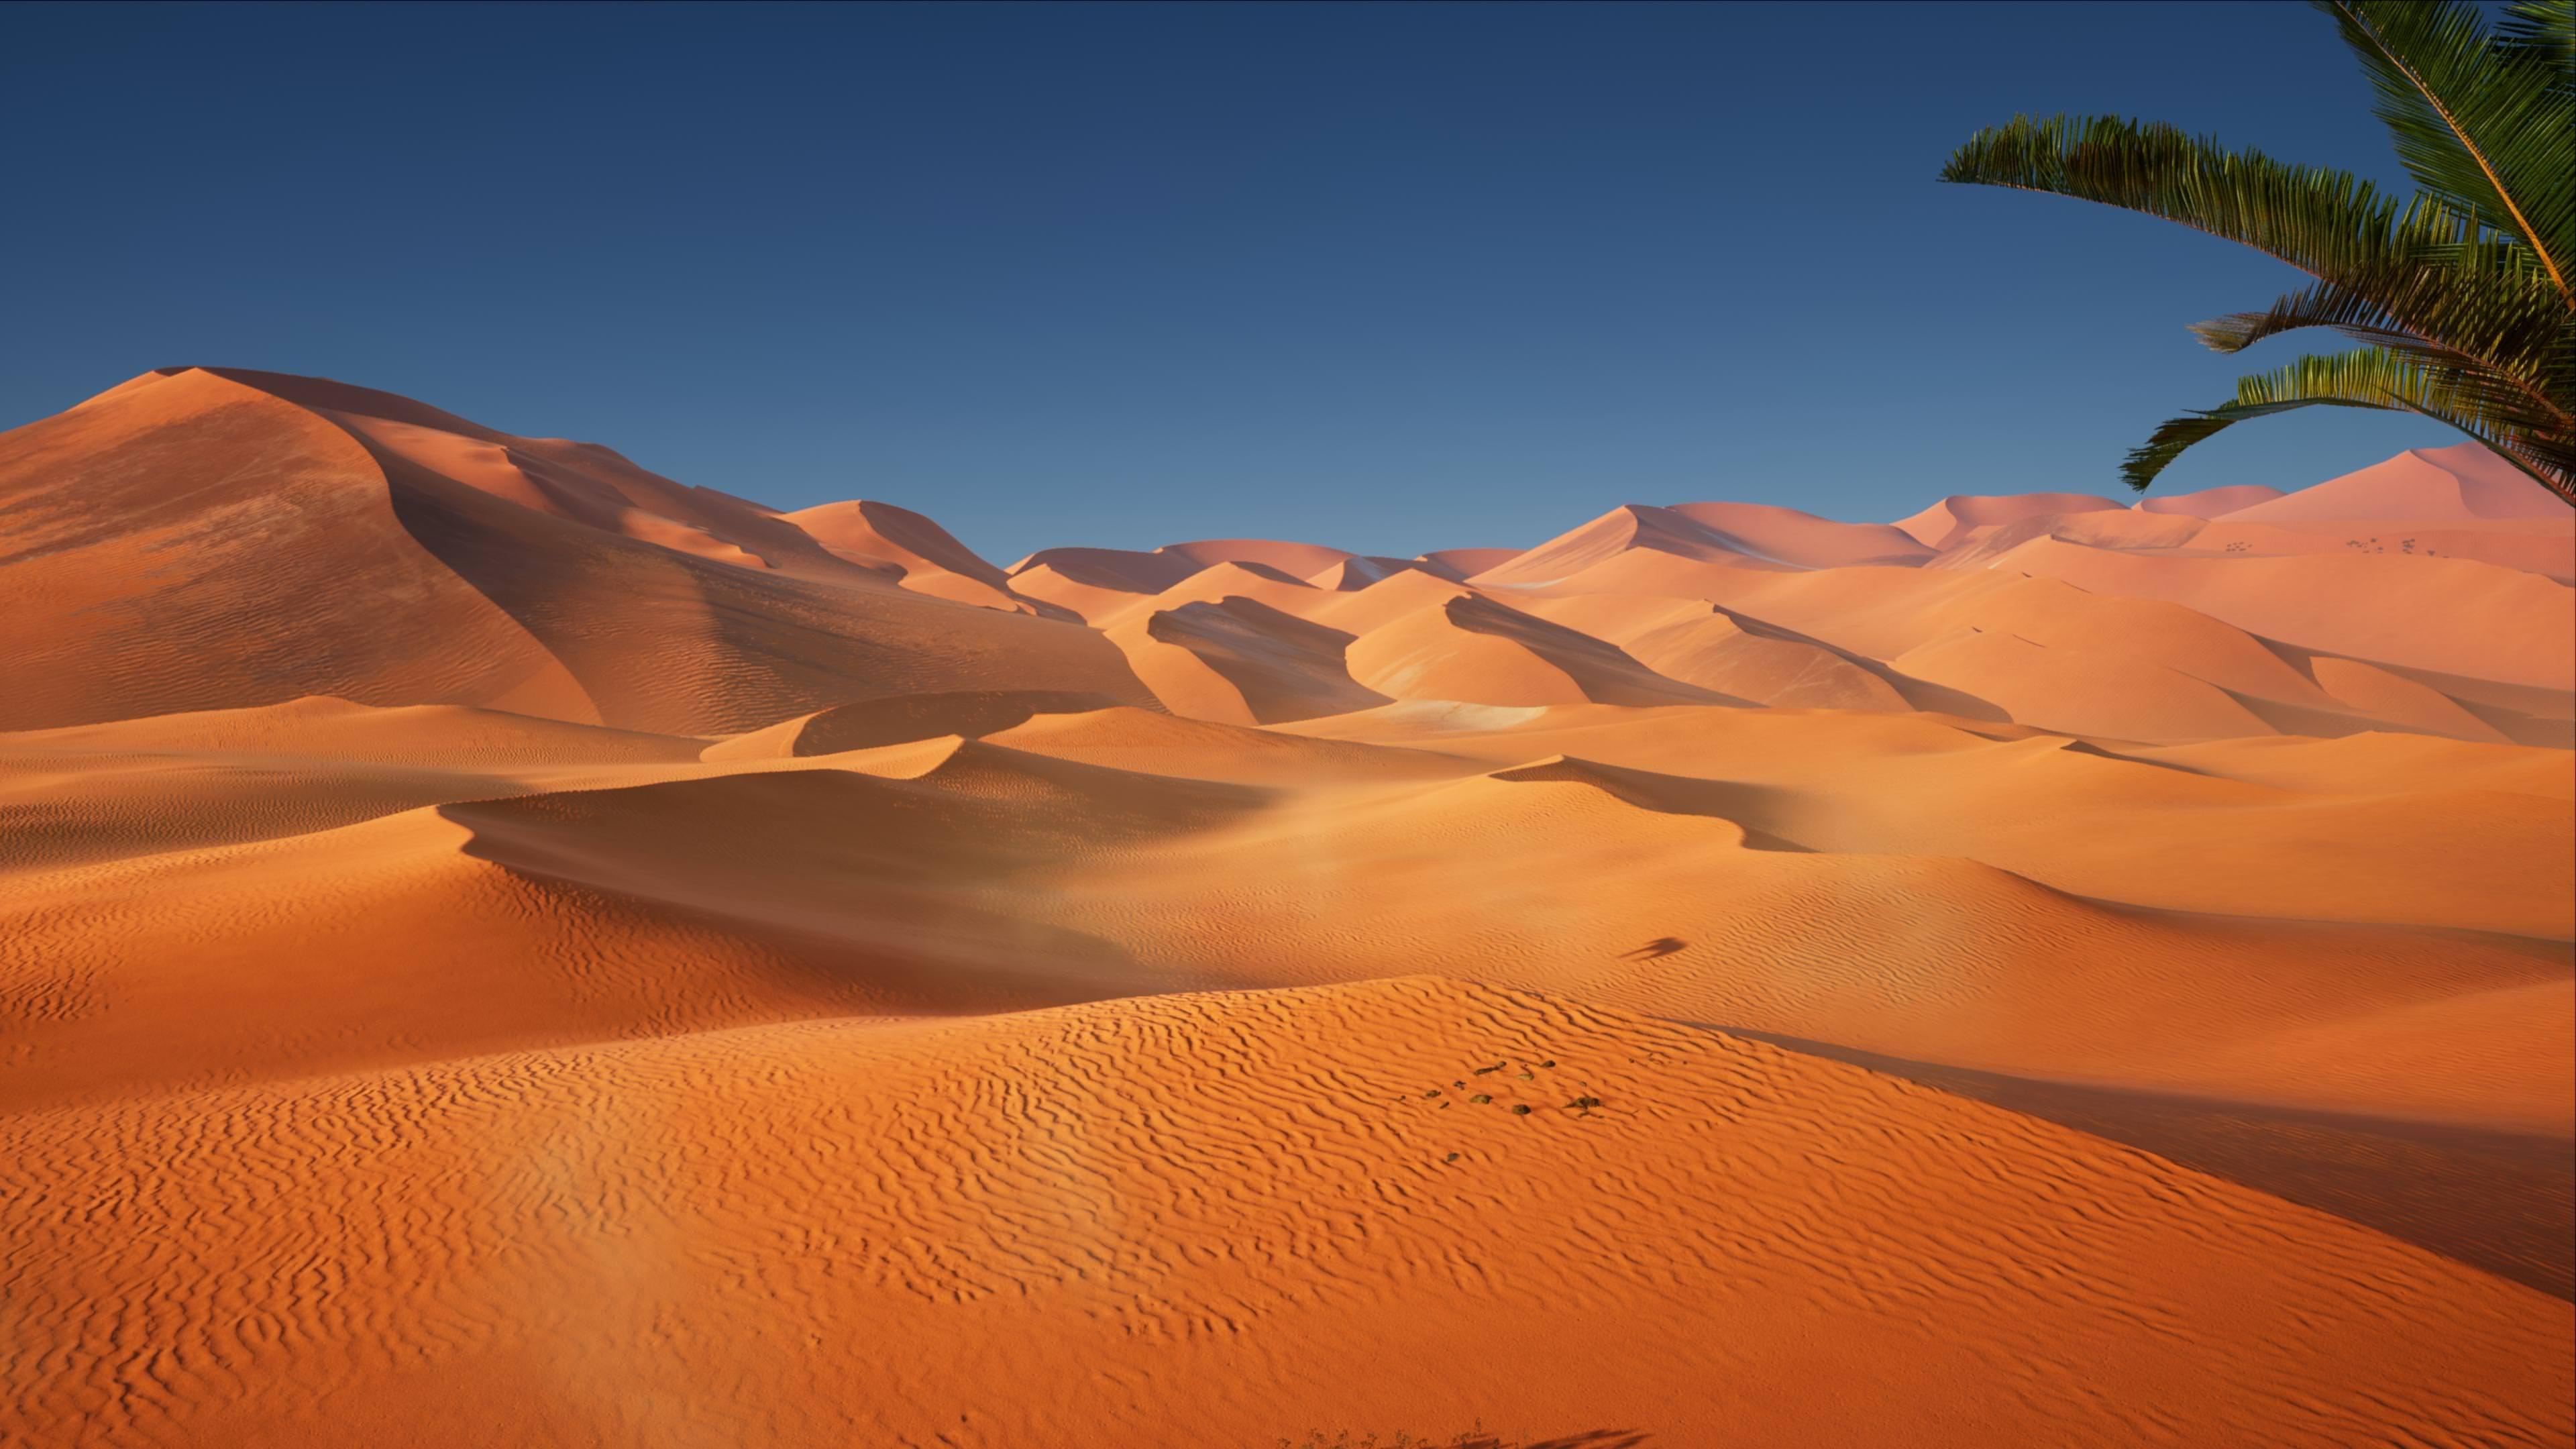 UE4/Unreal Engine 4 Realistic Sand Dunes,#Engine#Unreal   Womens